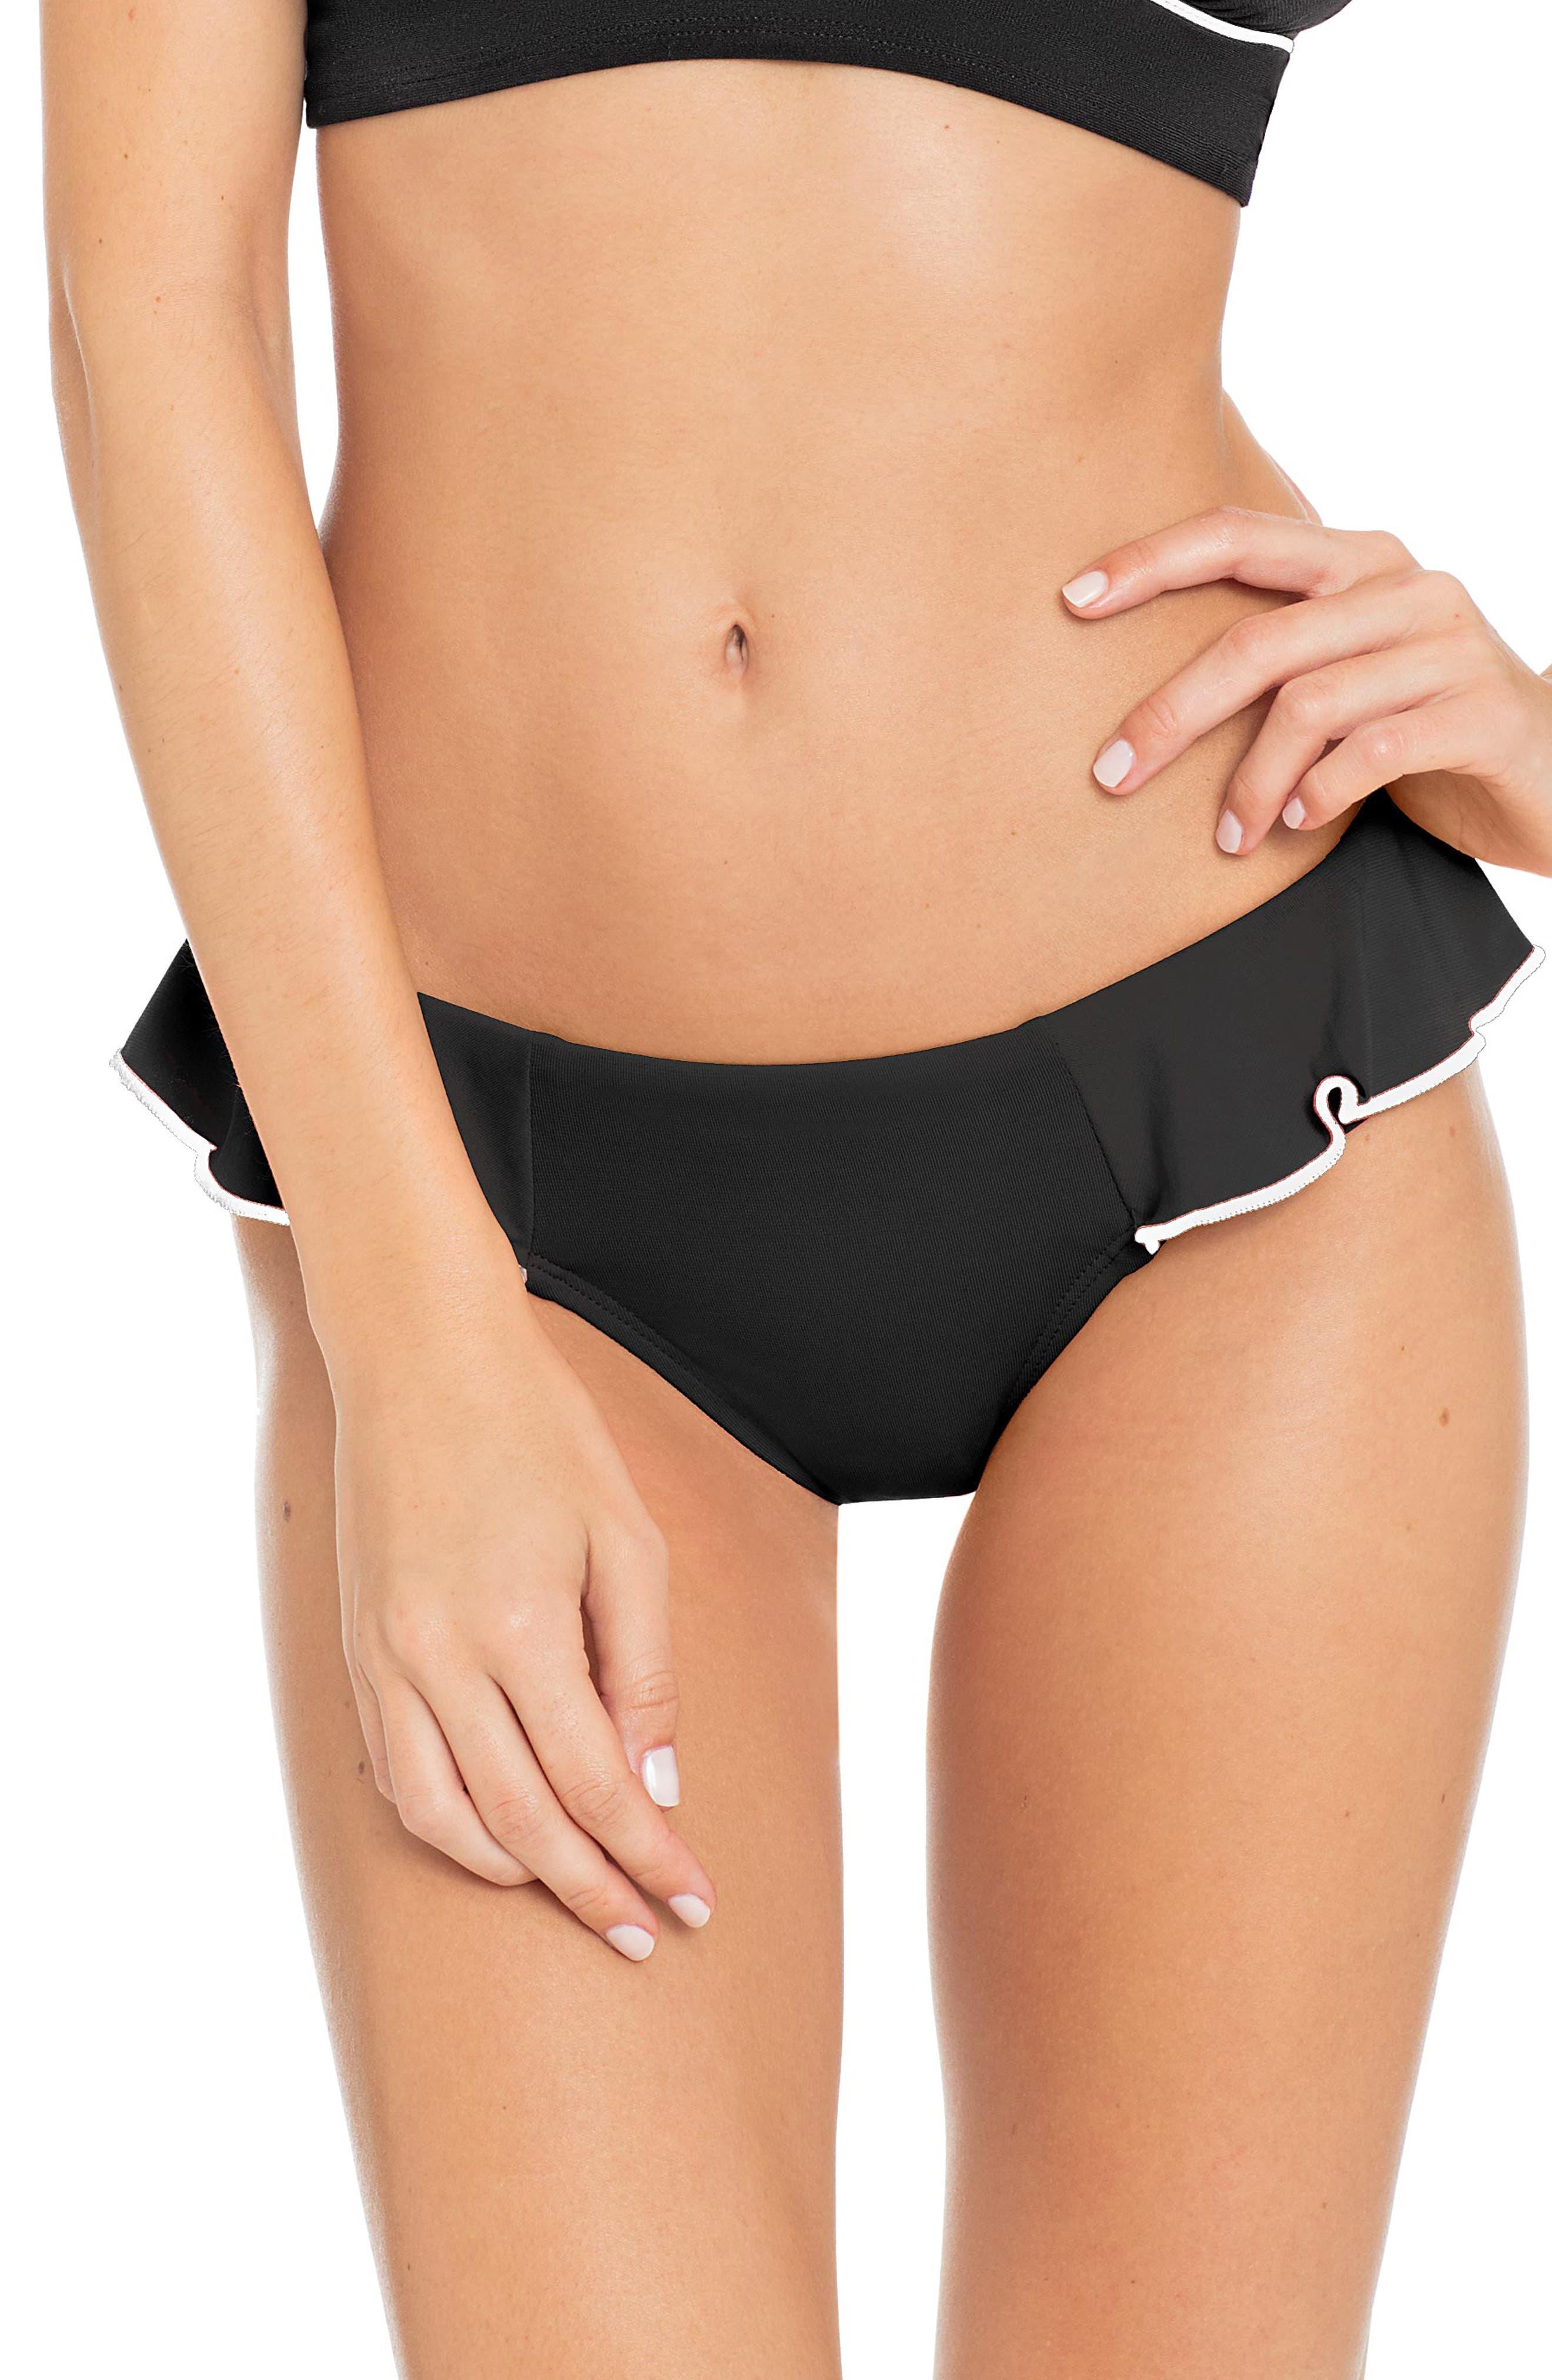 Malia Ruffle Bikini Bottoms,                             Main thumbnail 1, color,                             BLACK/ IVORY